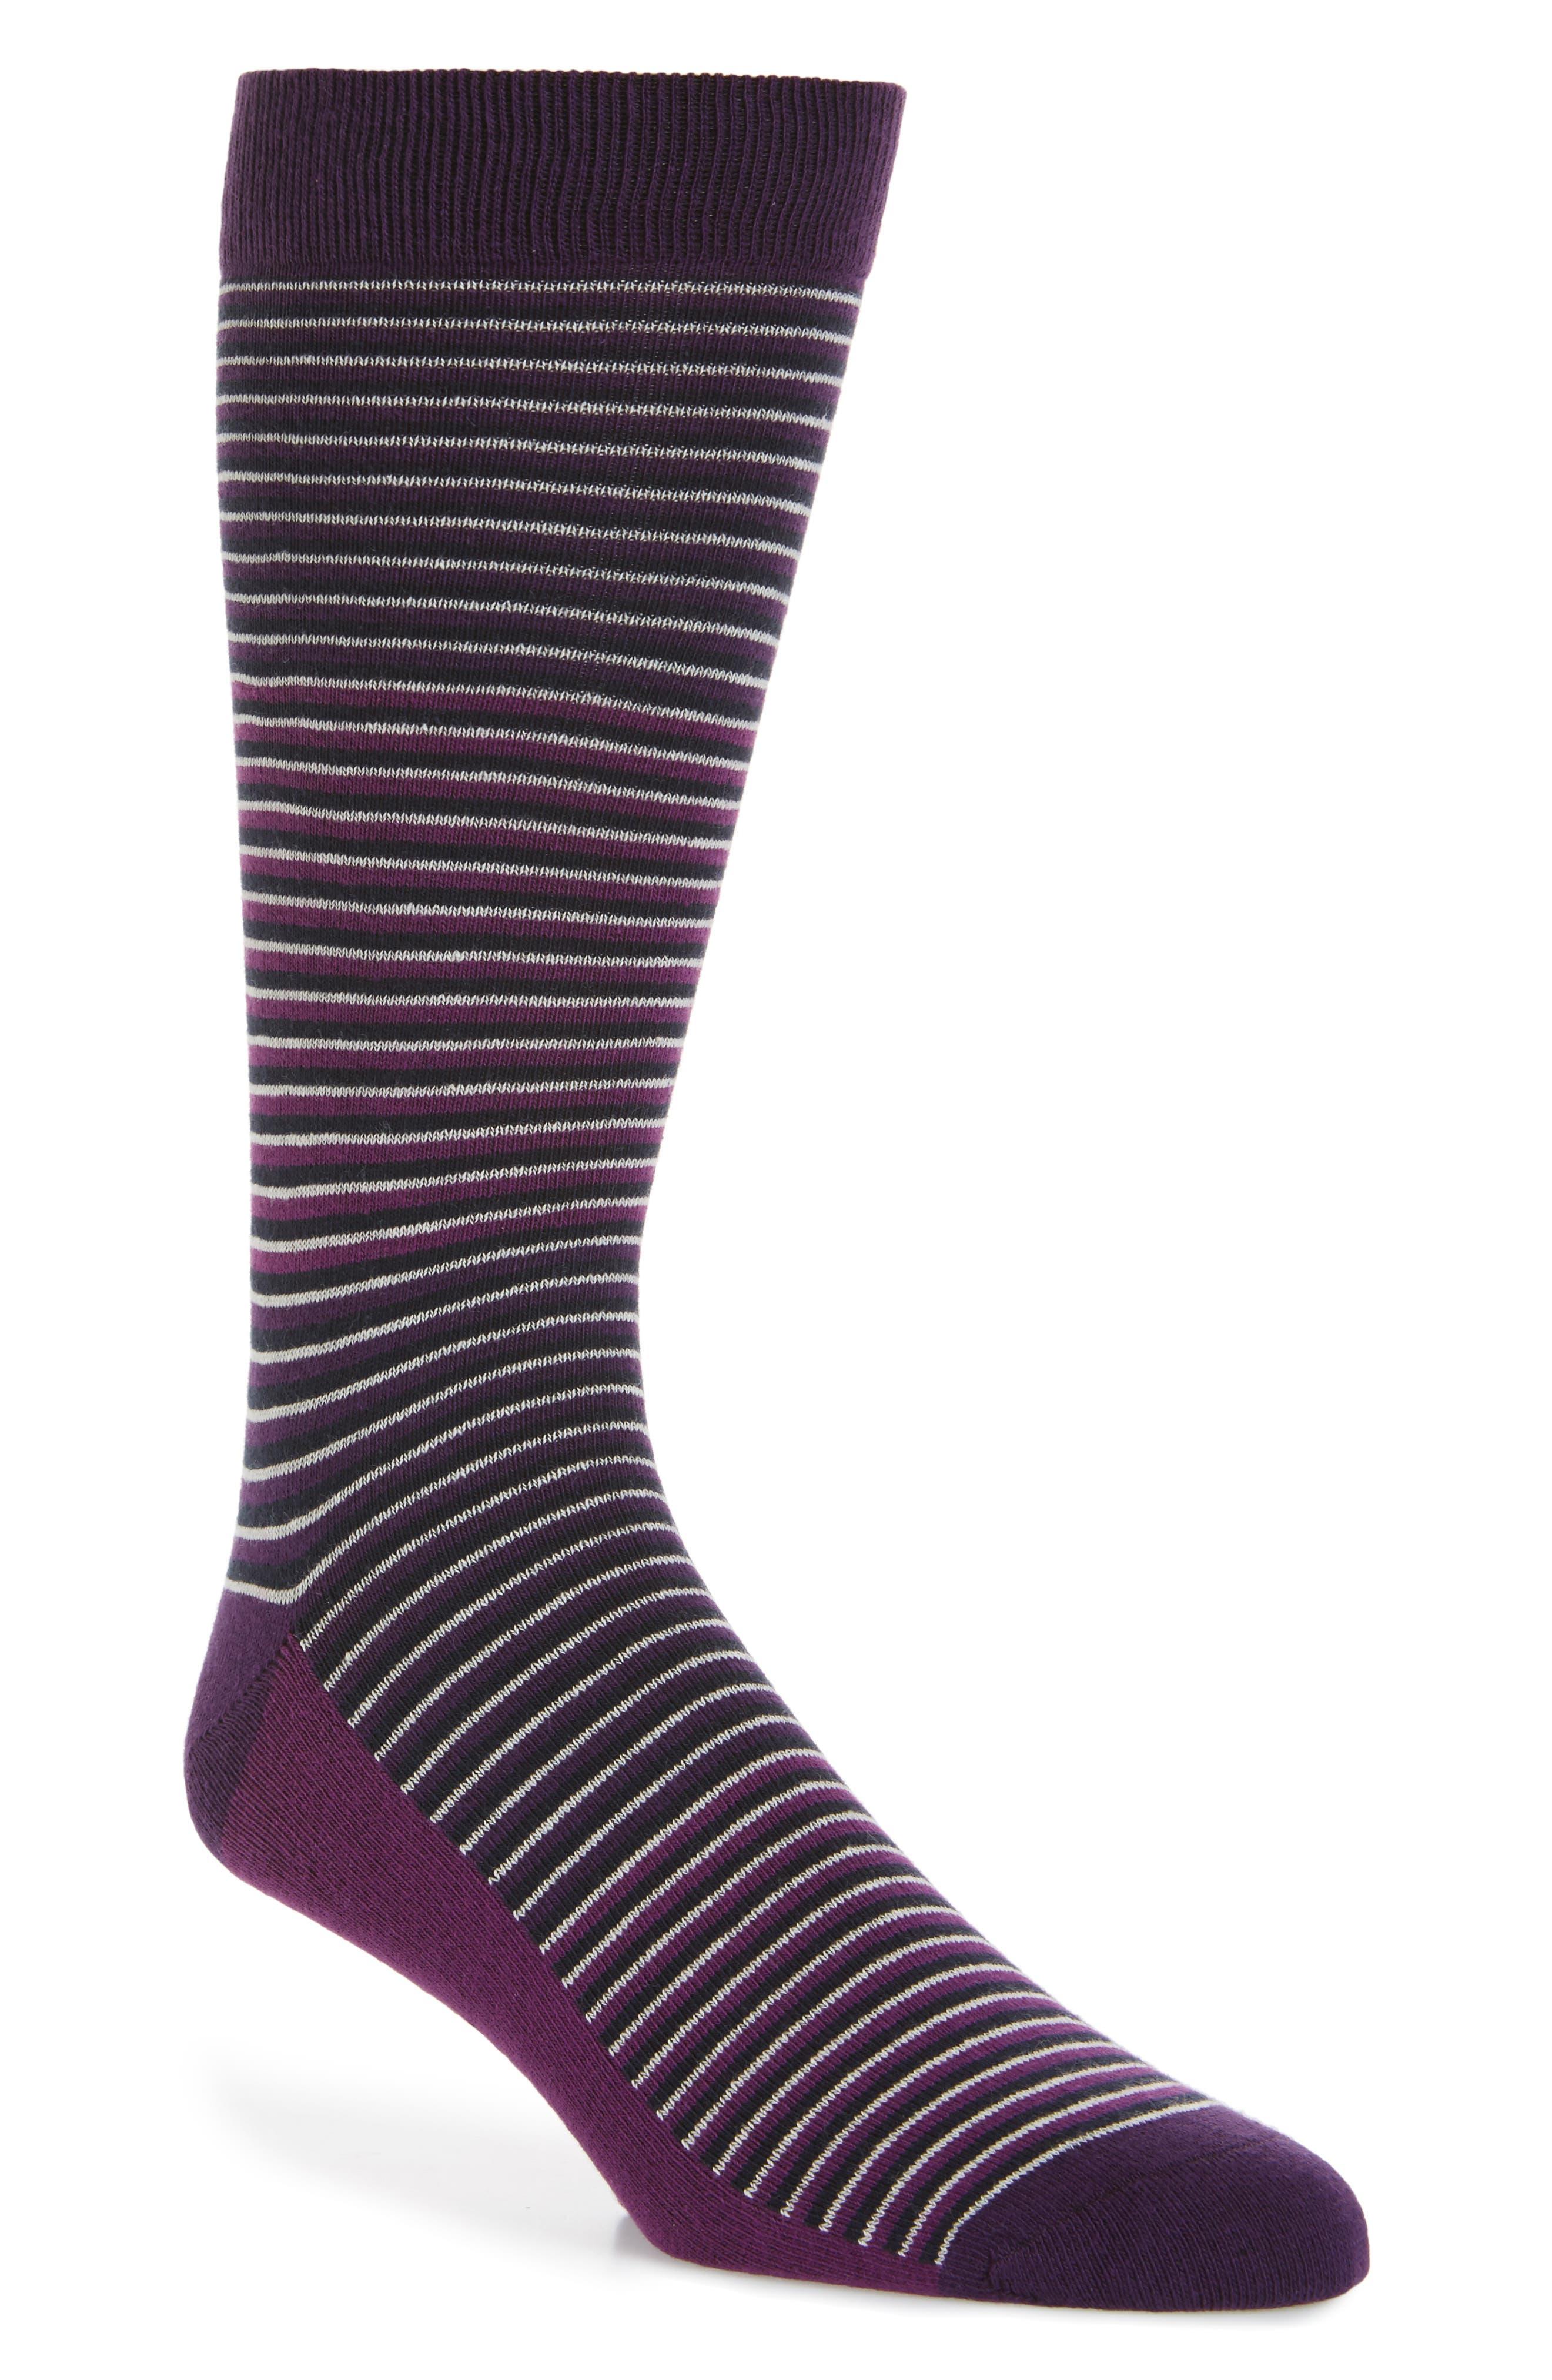 Chapel Stripe Socks,                         Main,                         color, Purple